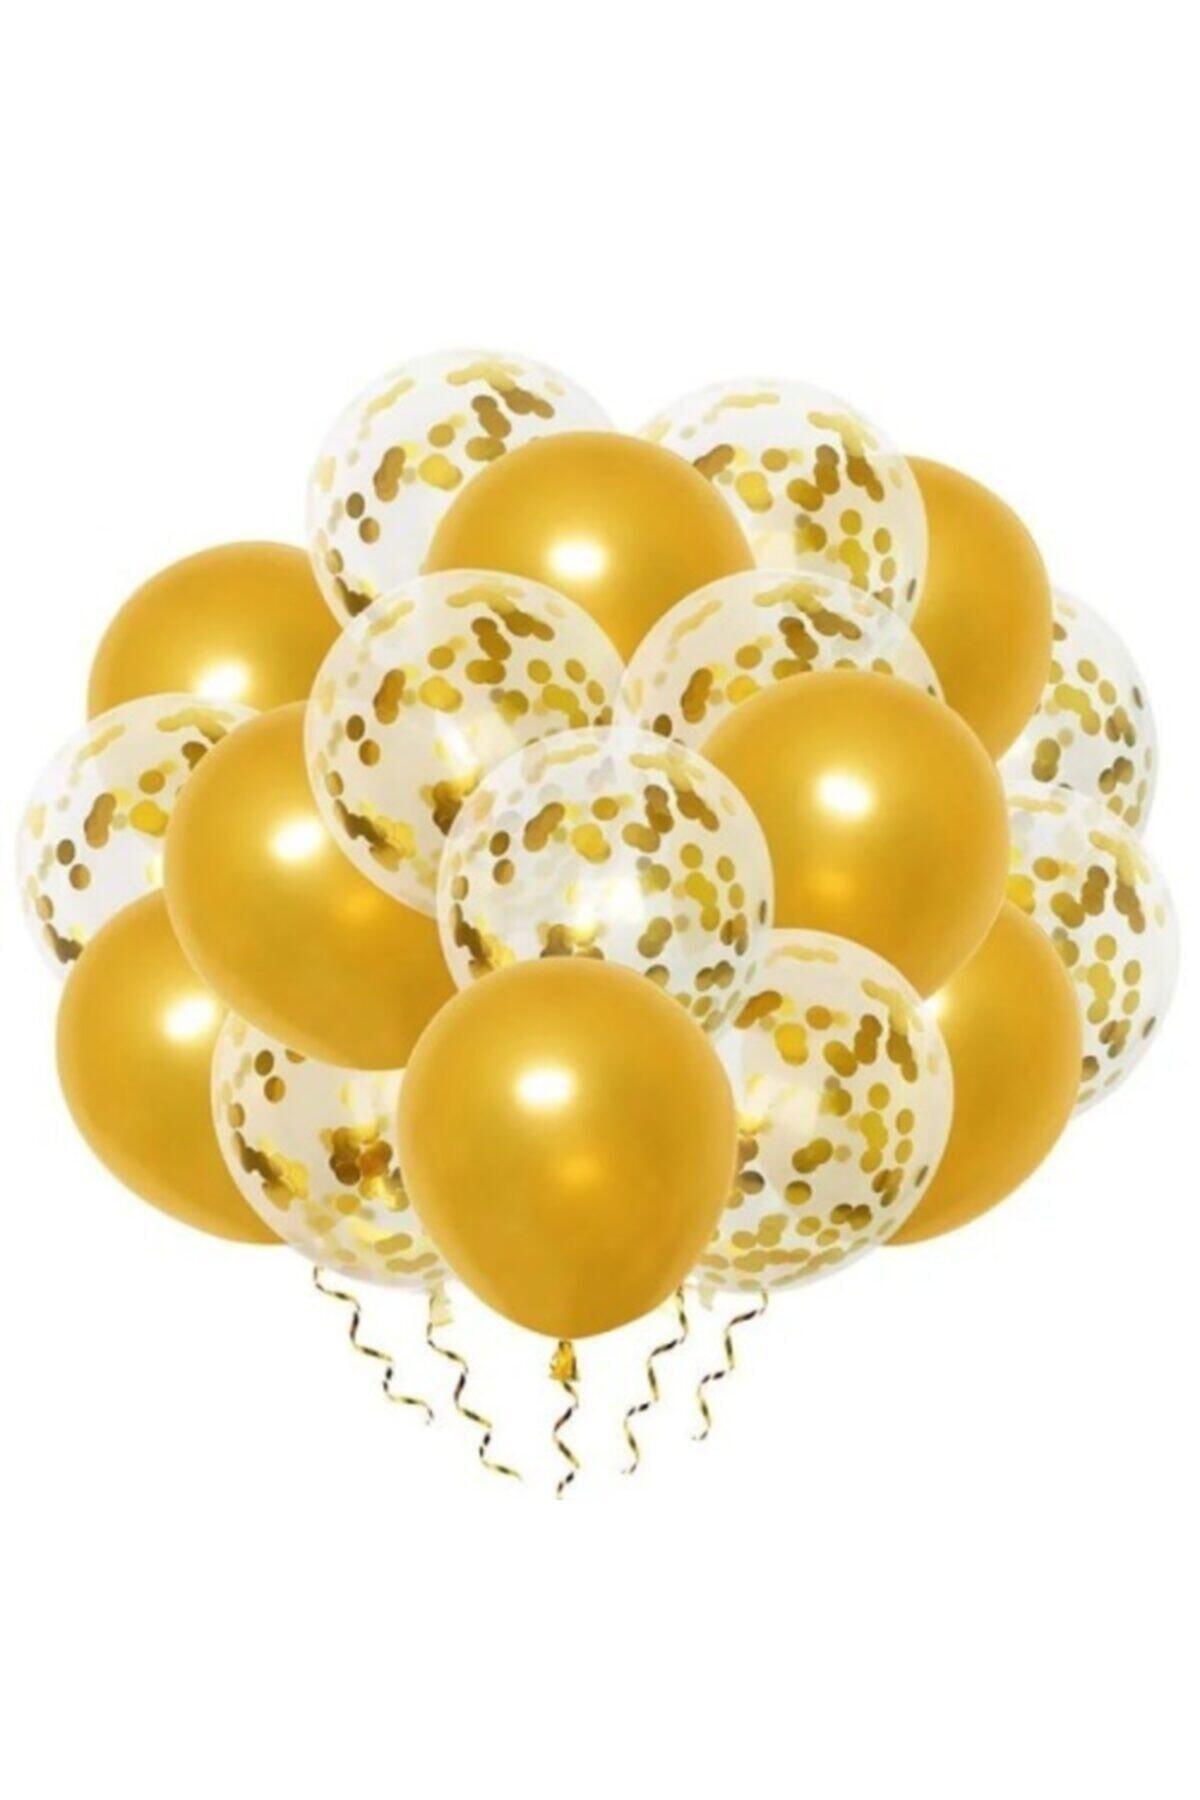 Gold Konfetili Şeffaf Balon Ve Metalik Gold Balon Seti 20 Adet